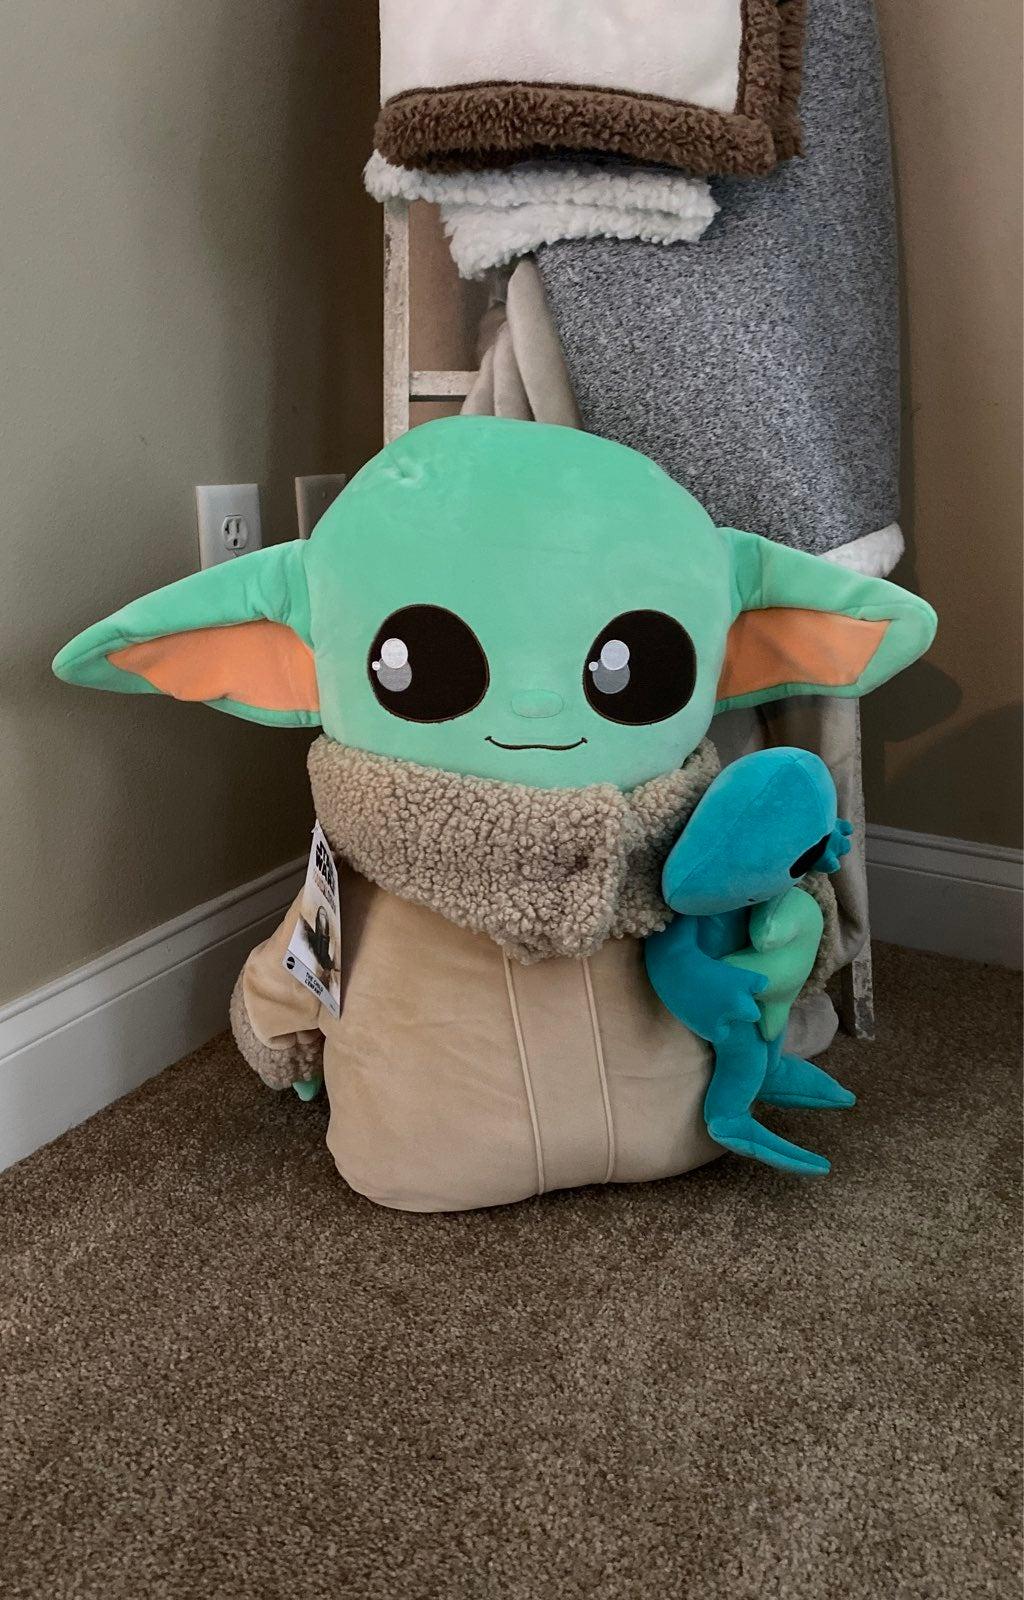 Baby Yoda Gigantic Plush